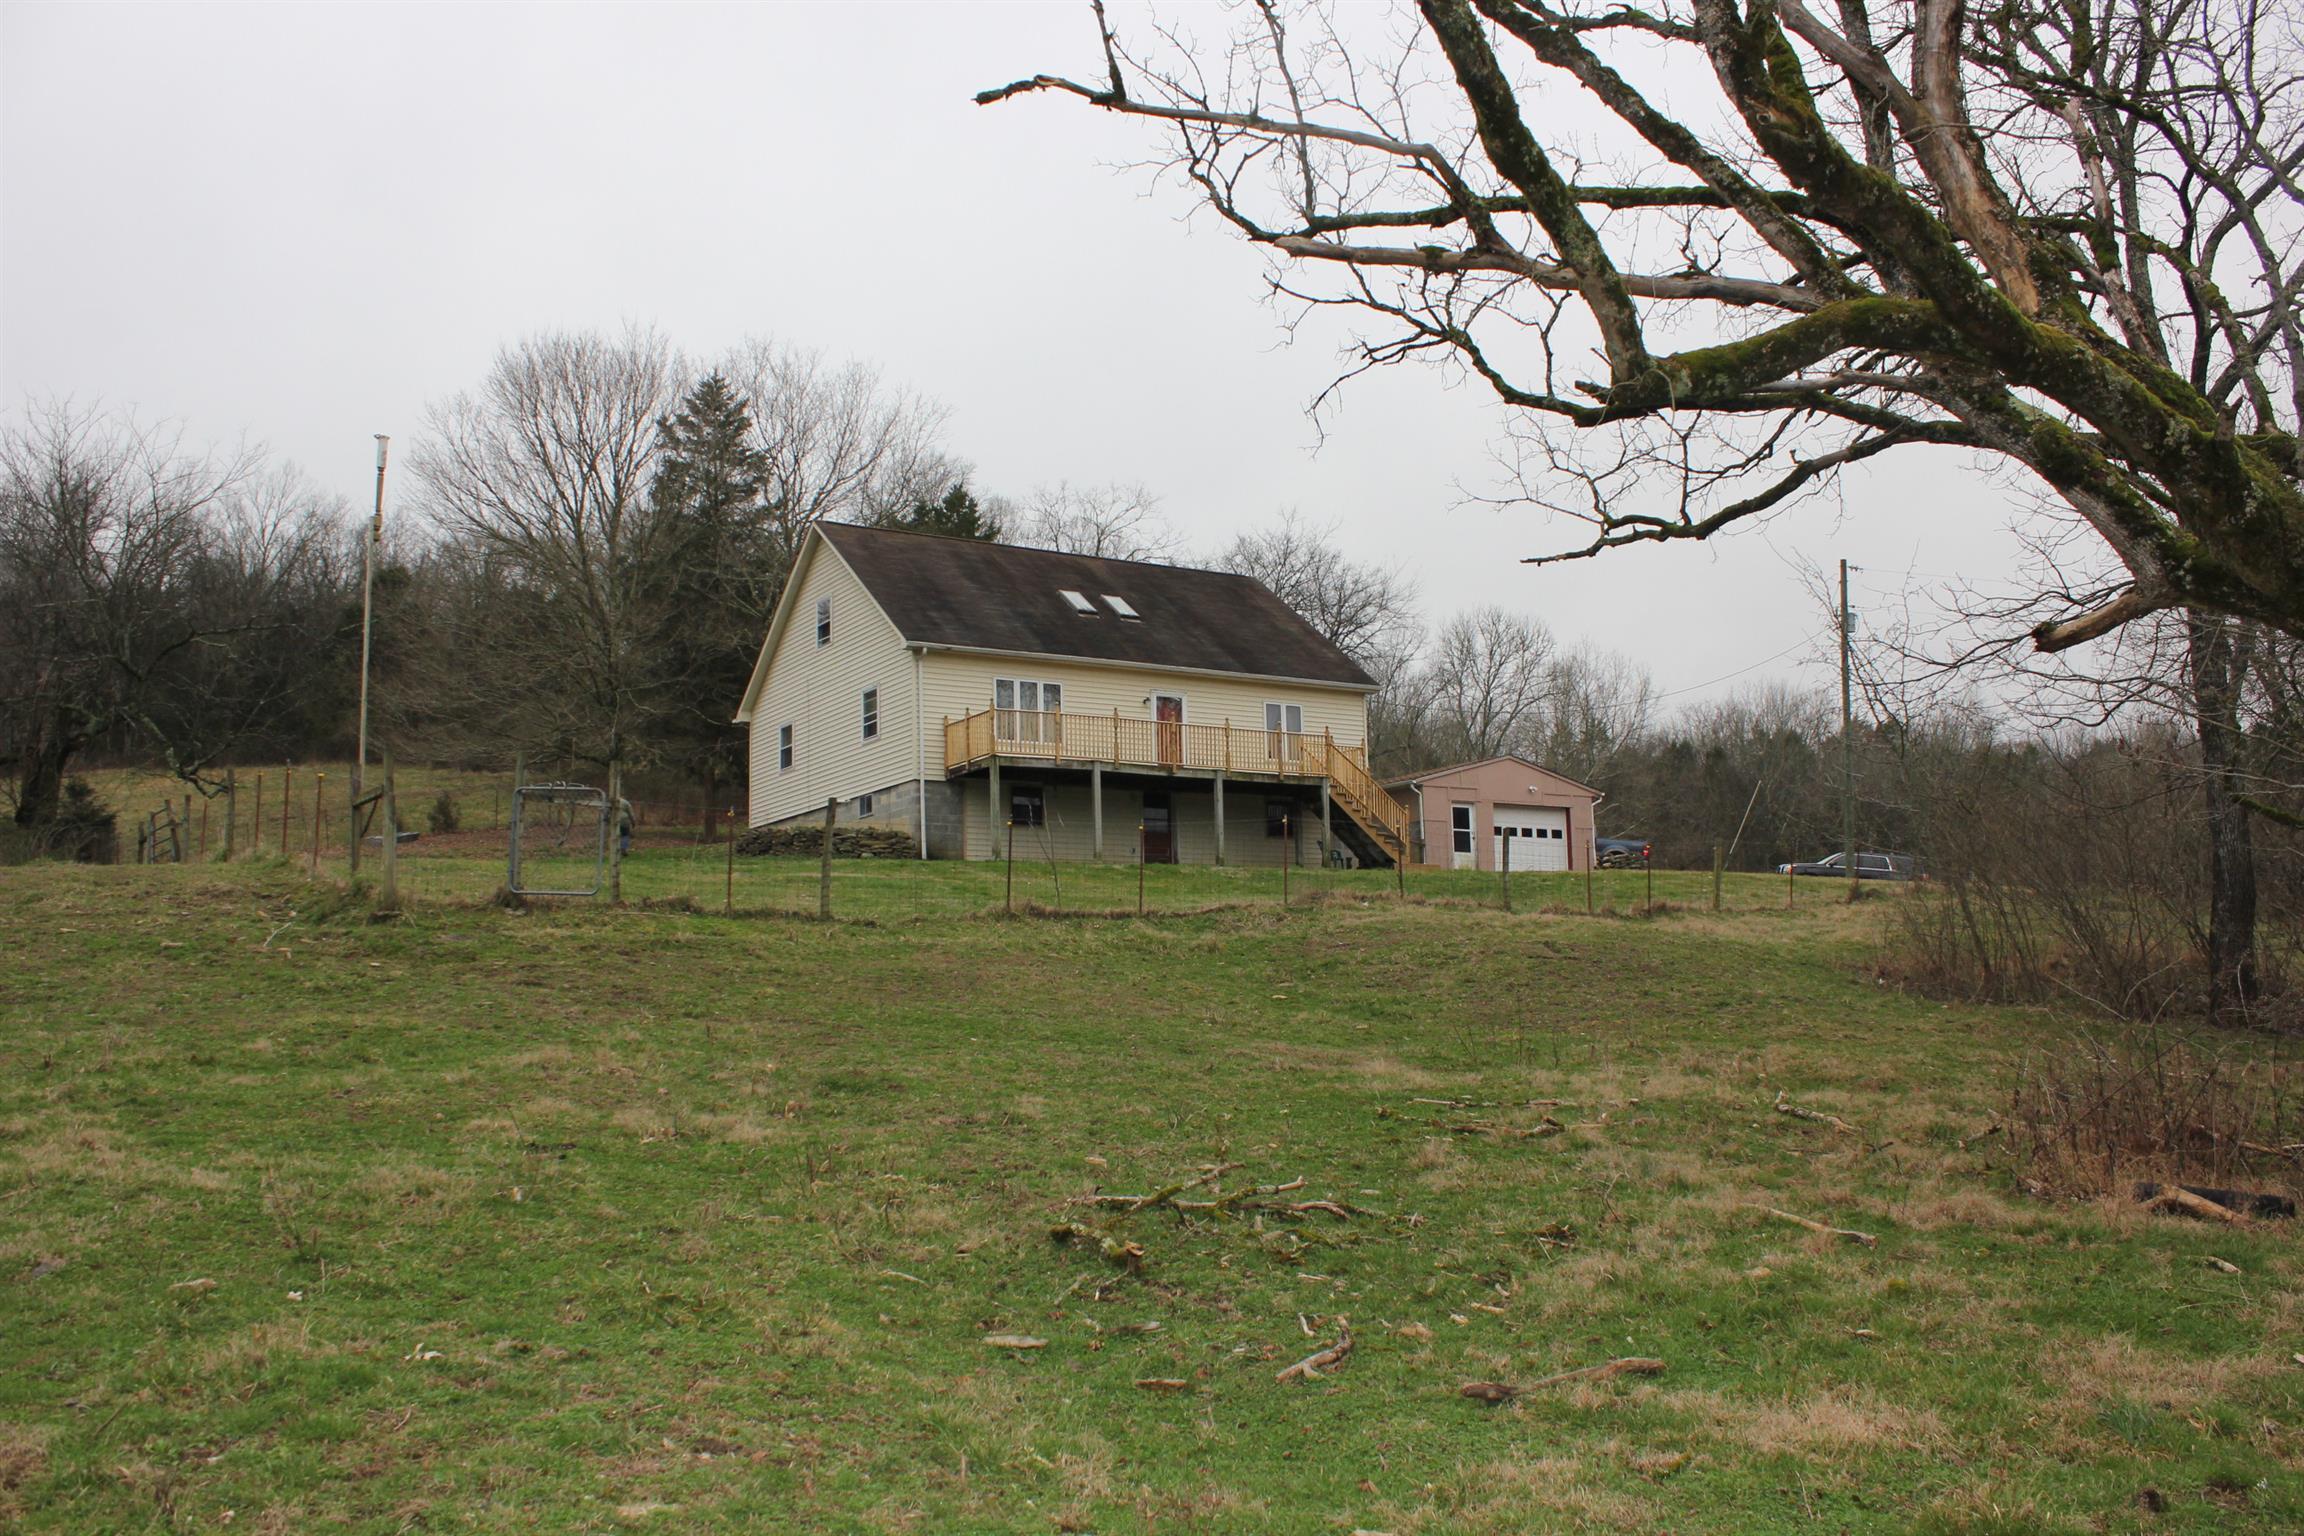 135 Fuss Hollow Rd, Petersburg, TN 37144 - Petersburg, TN real estate listing